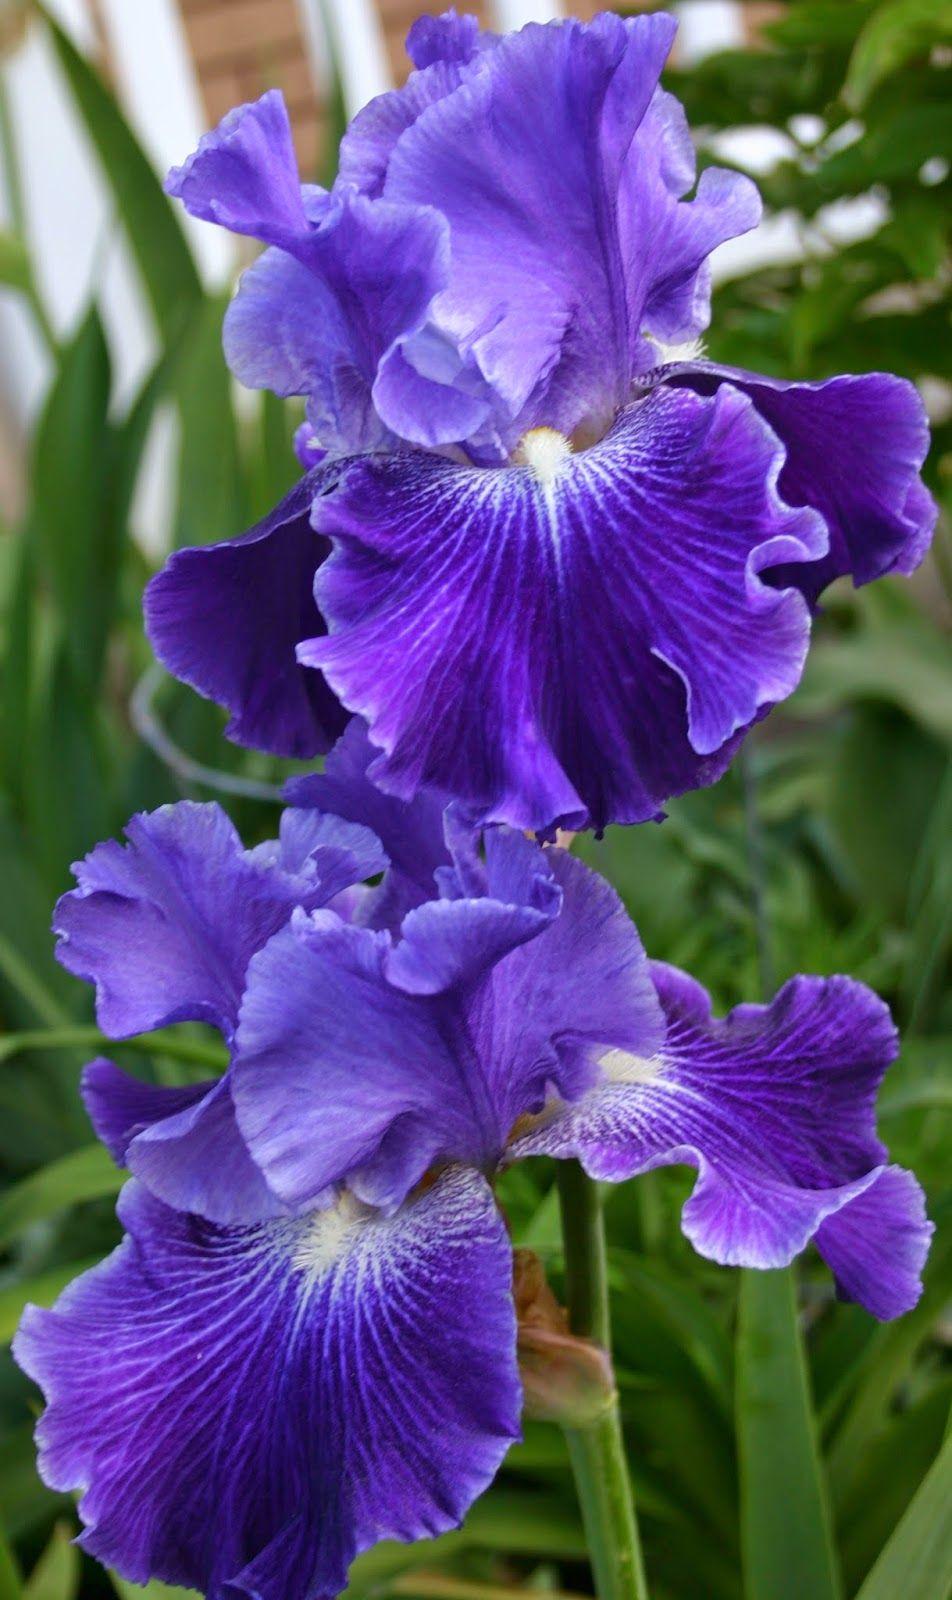 World Of Irises The Blue Iris Garden Planting A Monochromatic Tall Bearded Iris Bed Iris Garden Iris Flowers Purple Iris Flowers